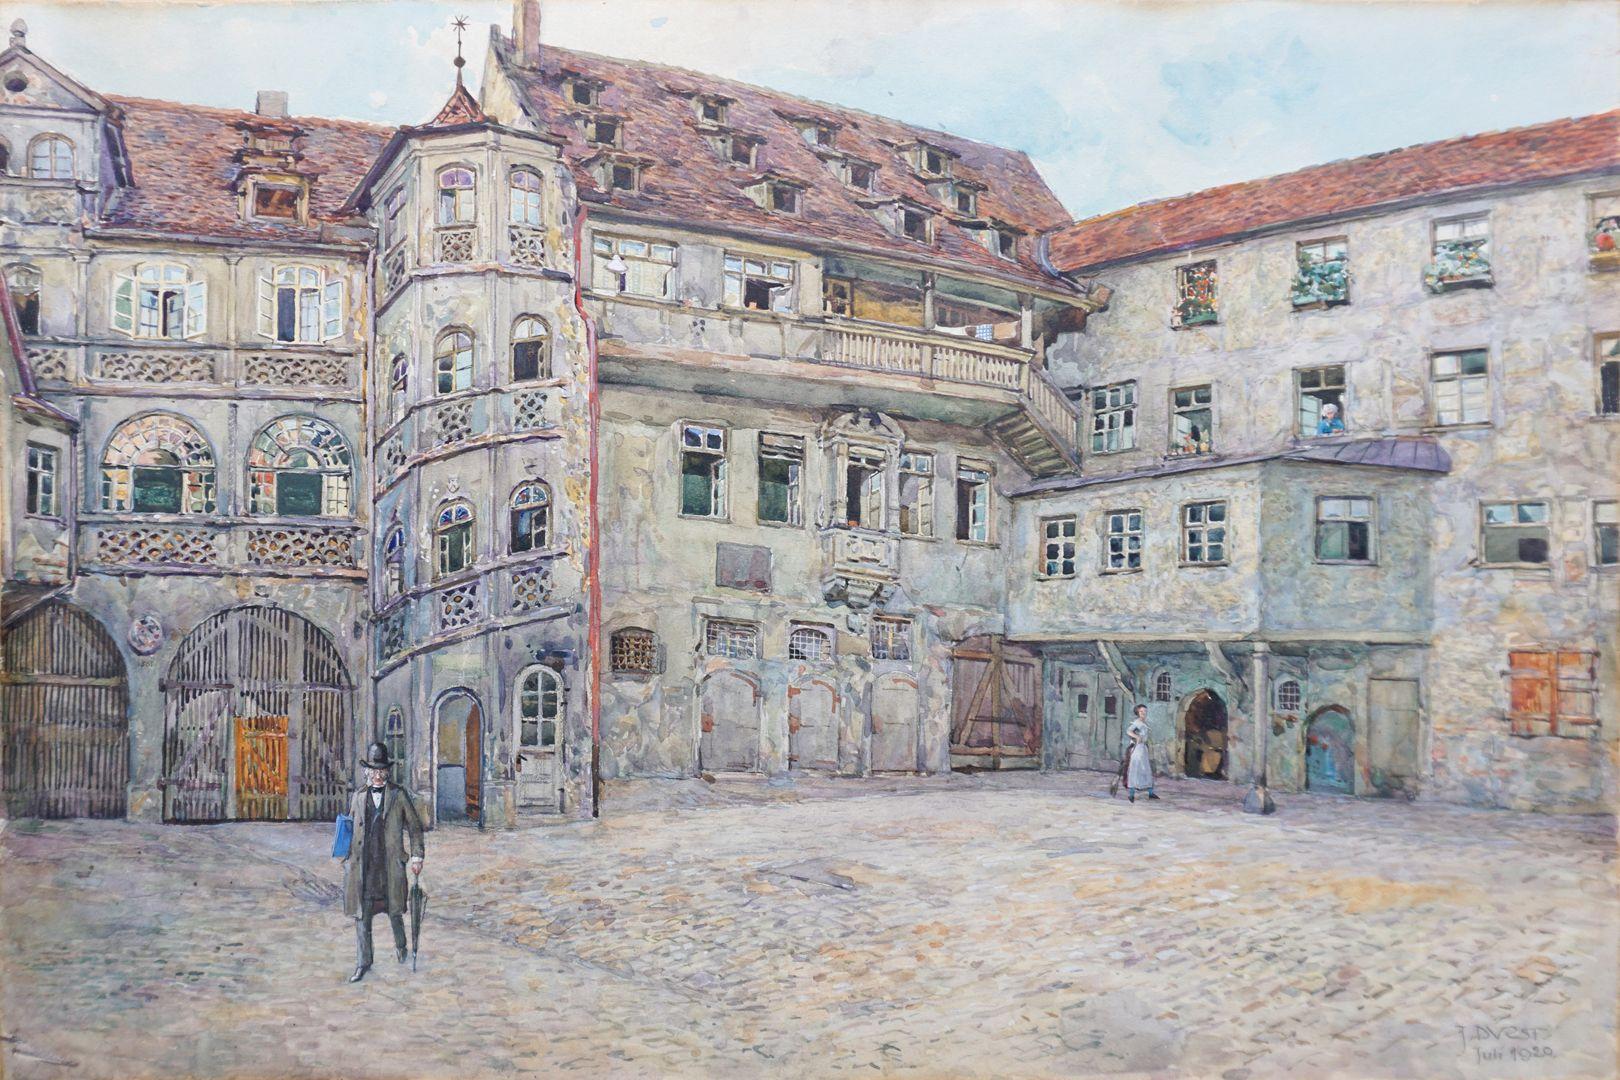 Bayerischer Hof in Nürnberg